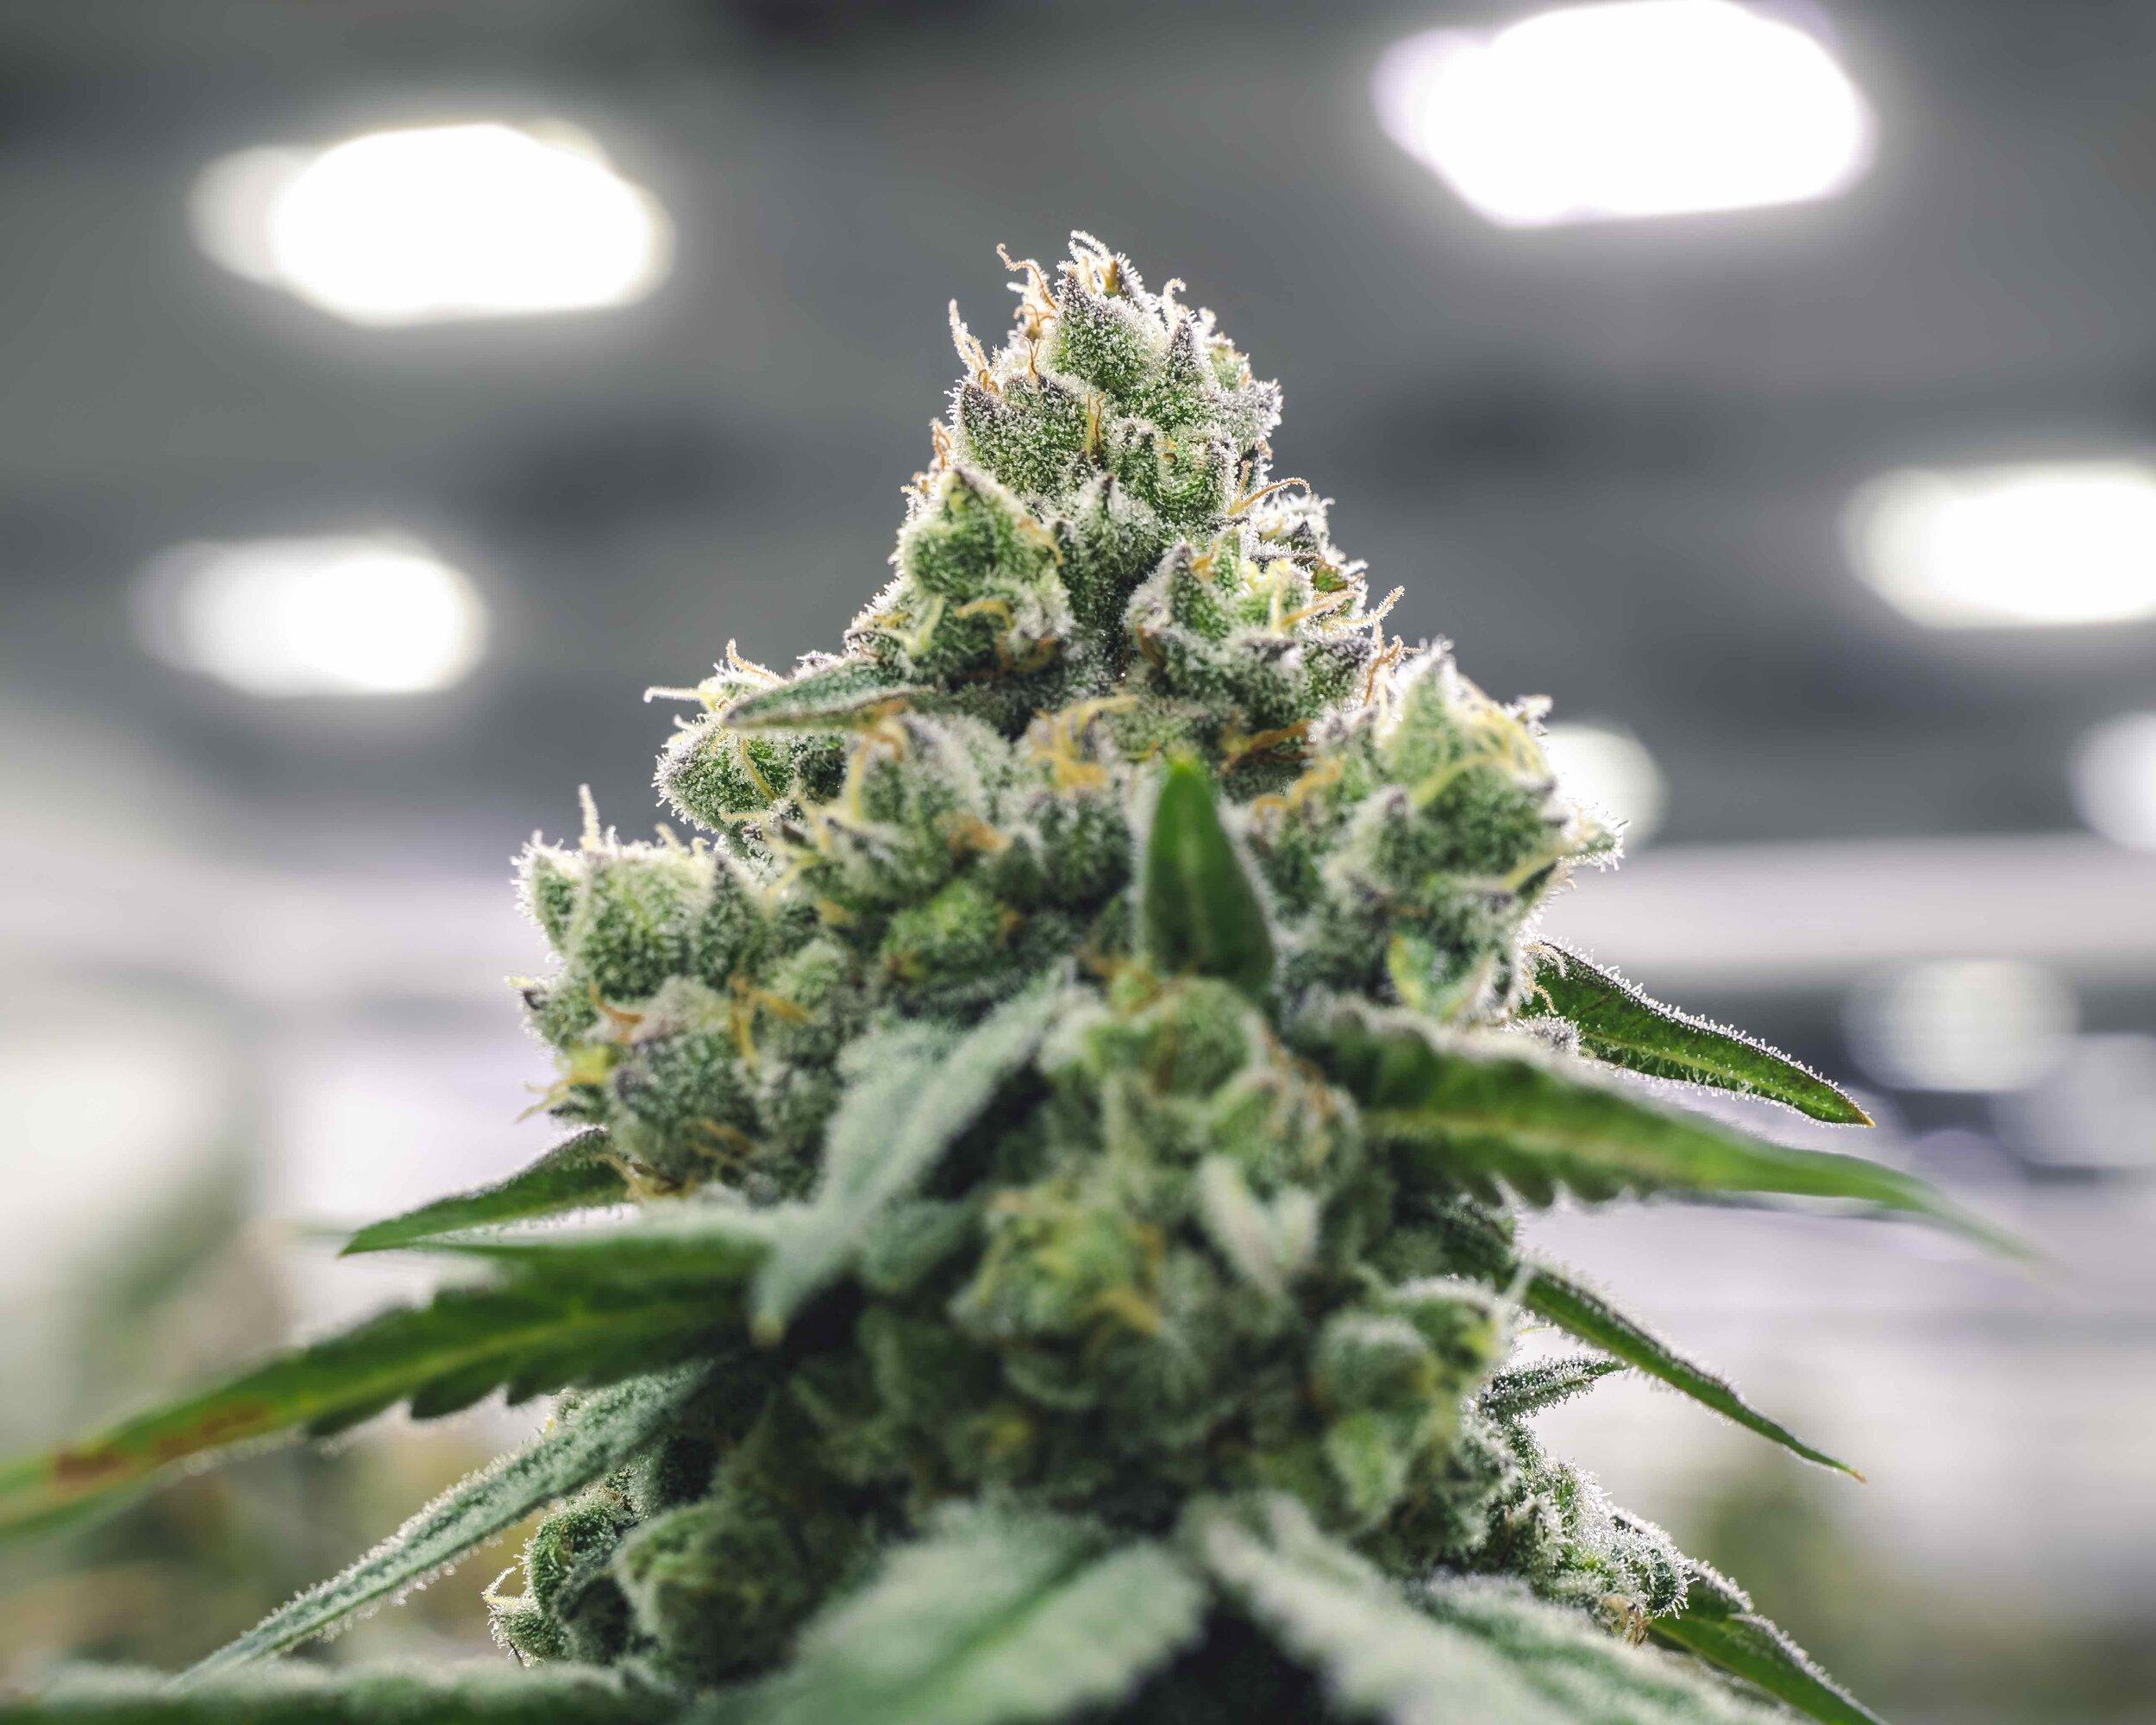 Commercial_Marijuana_Industry_Bud_on_Plant_at_Grow_Operation_Warehouse.jpeg